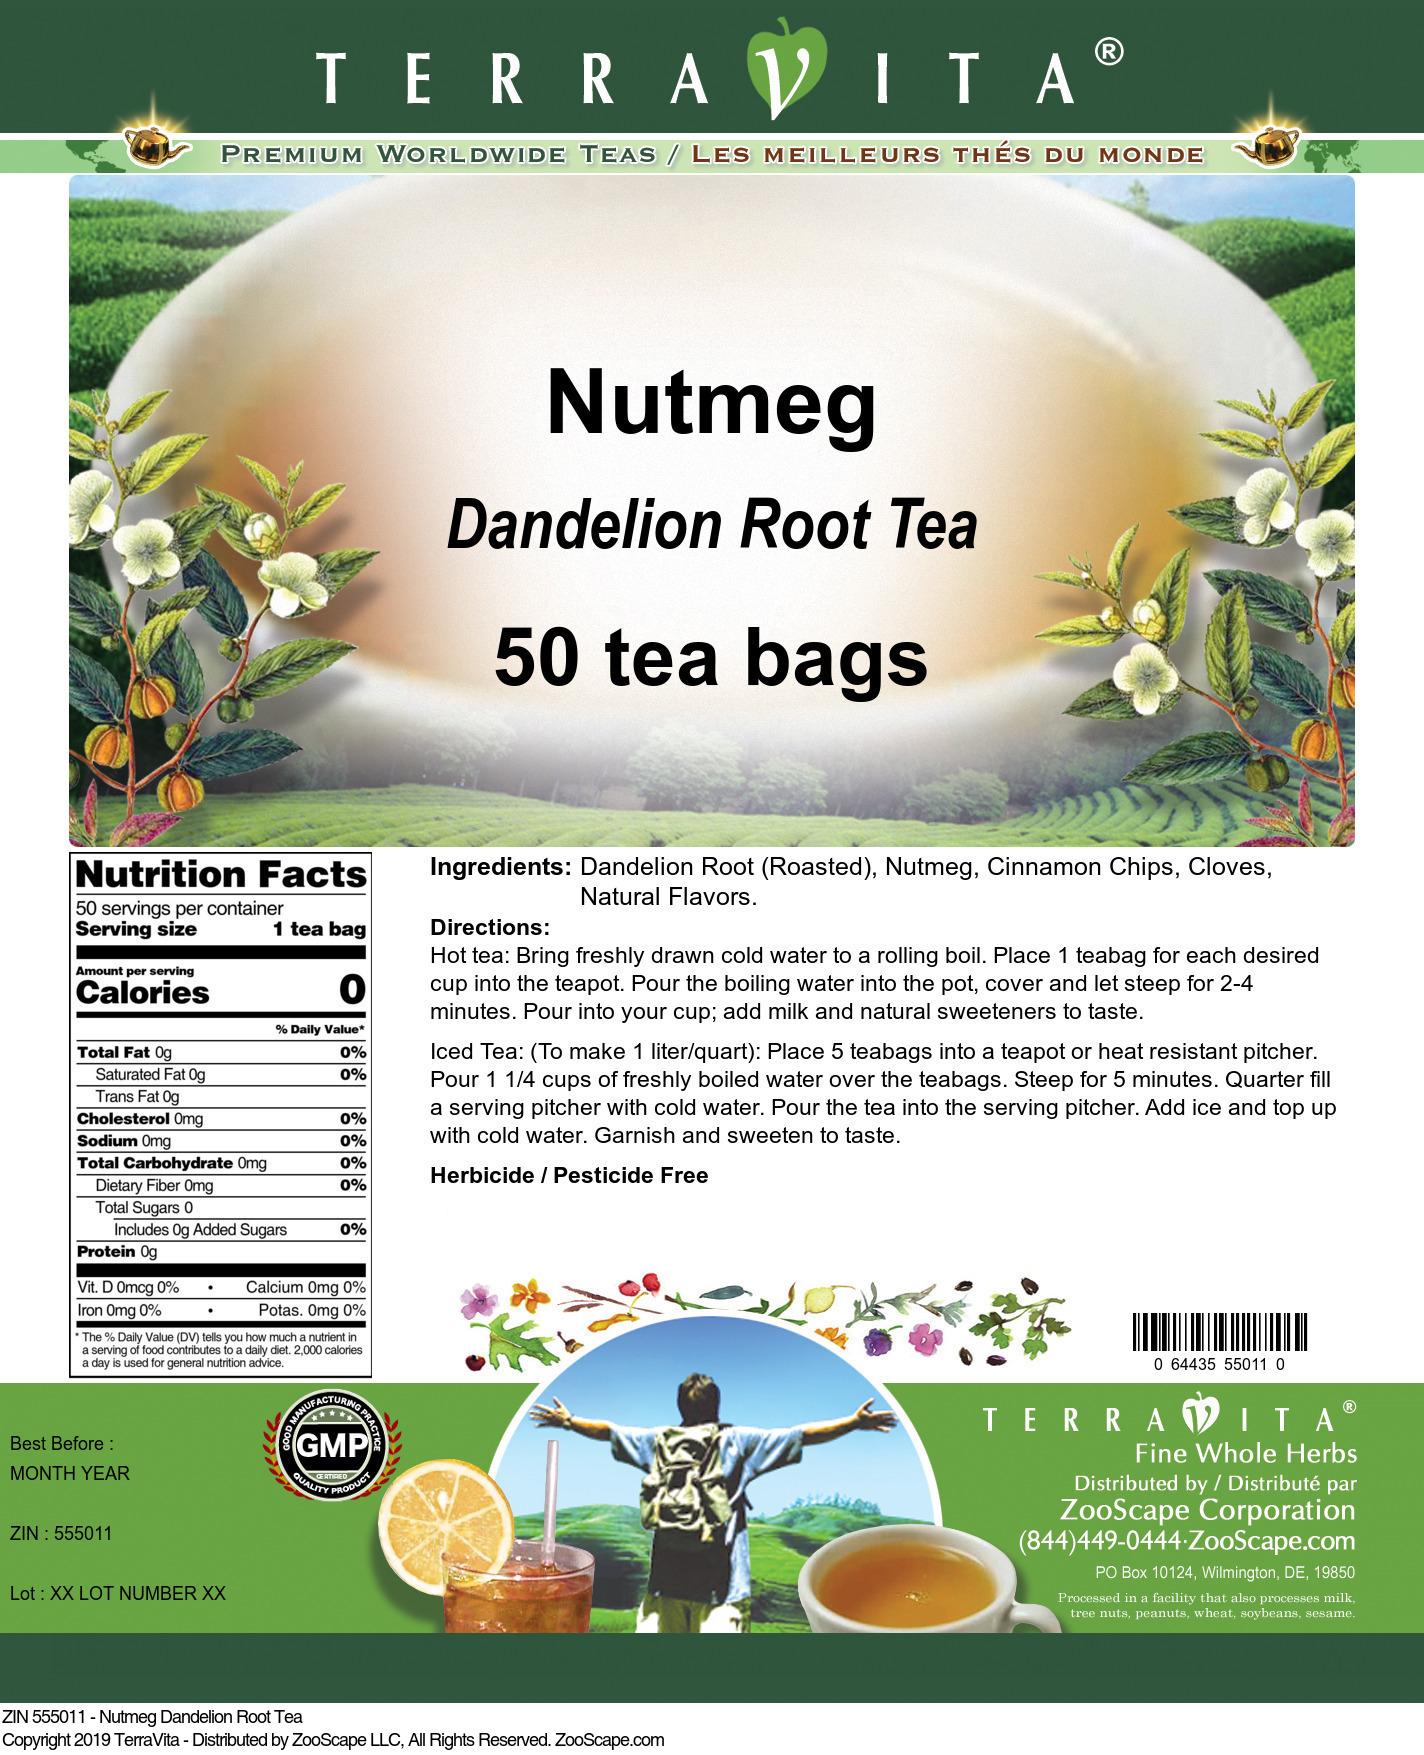 Nutmeg Dandelion Root Tea